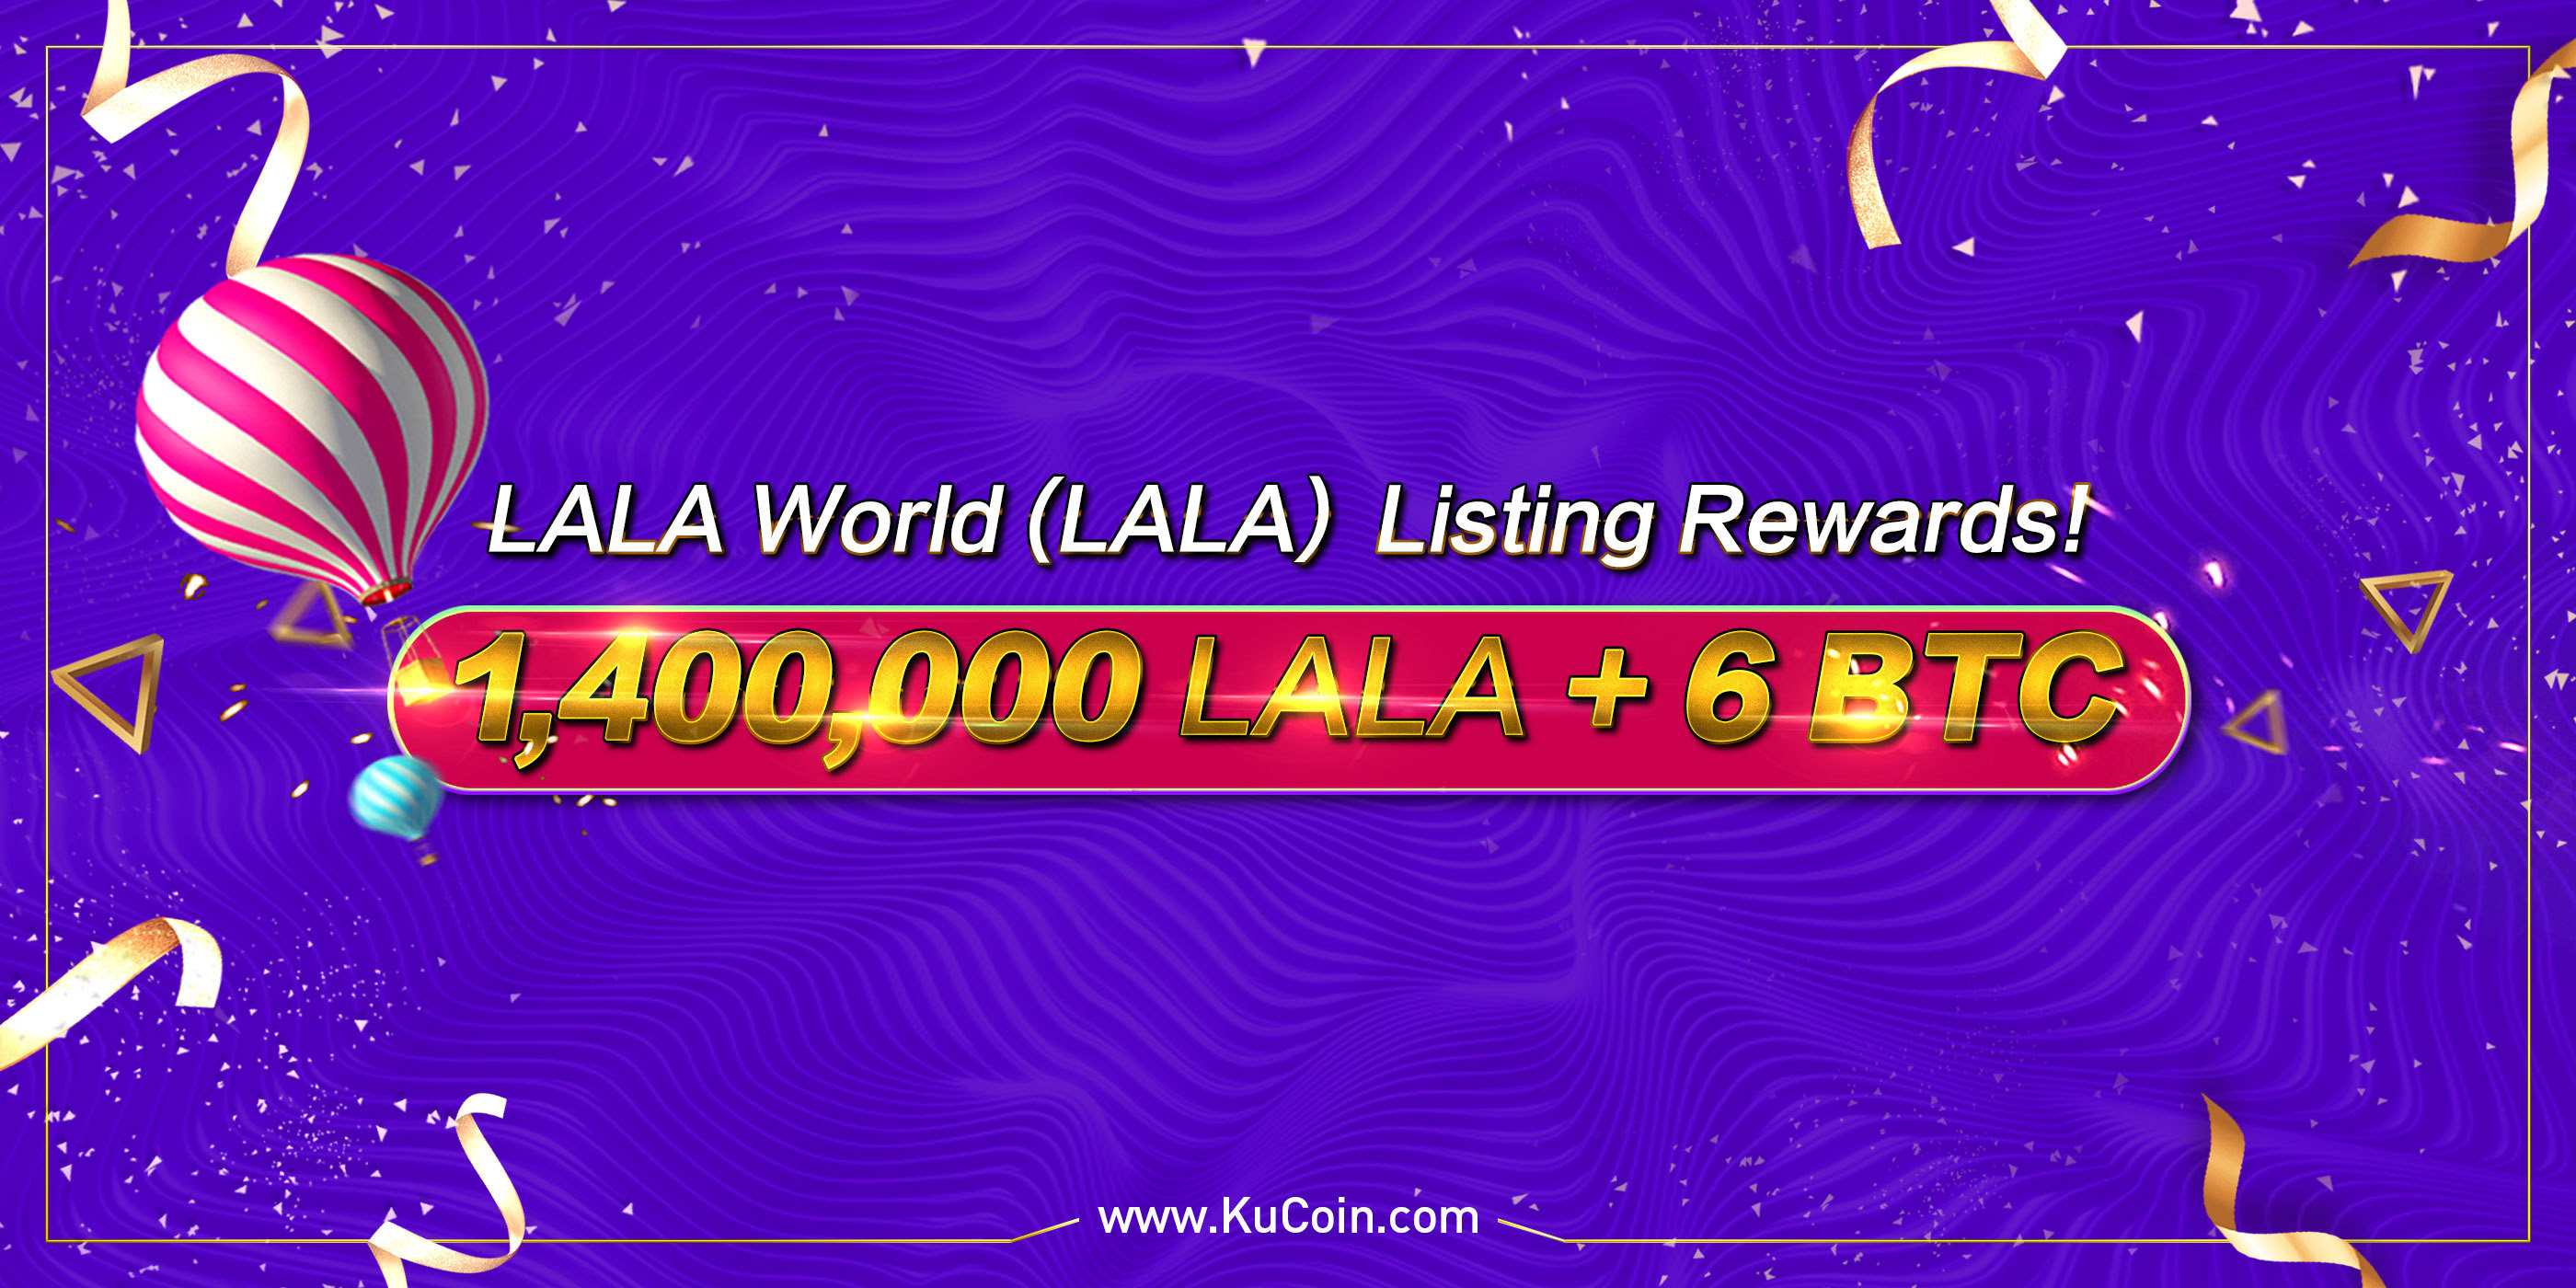 LALA World (LALA) Listing Rewards